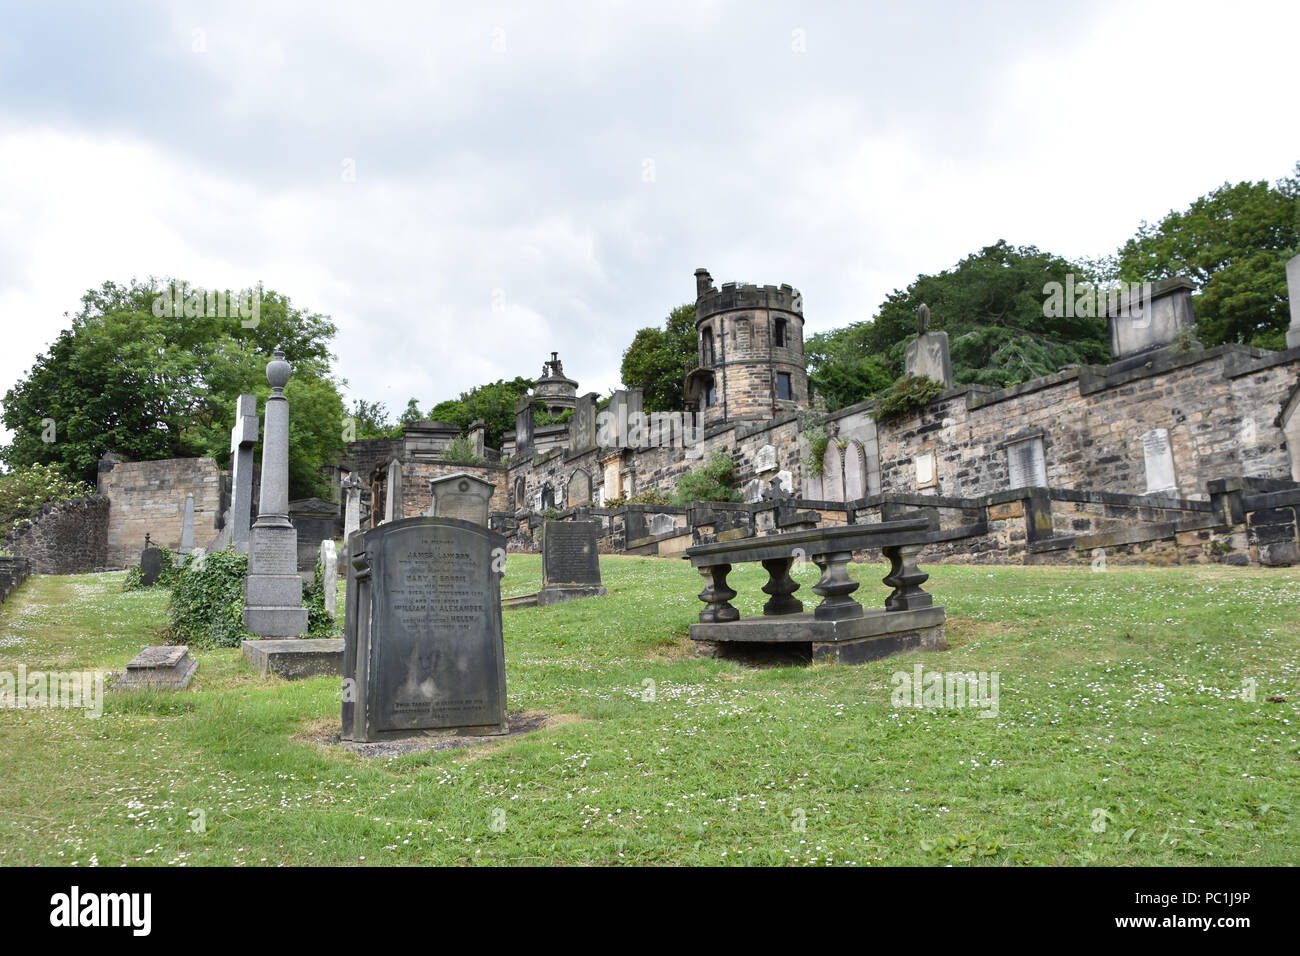 New Calton Burial Ground, Edinburgh, Scotland. June, 2018 Stock Photo